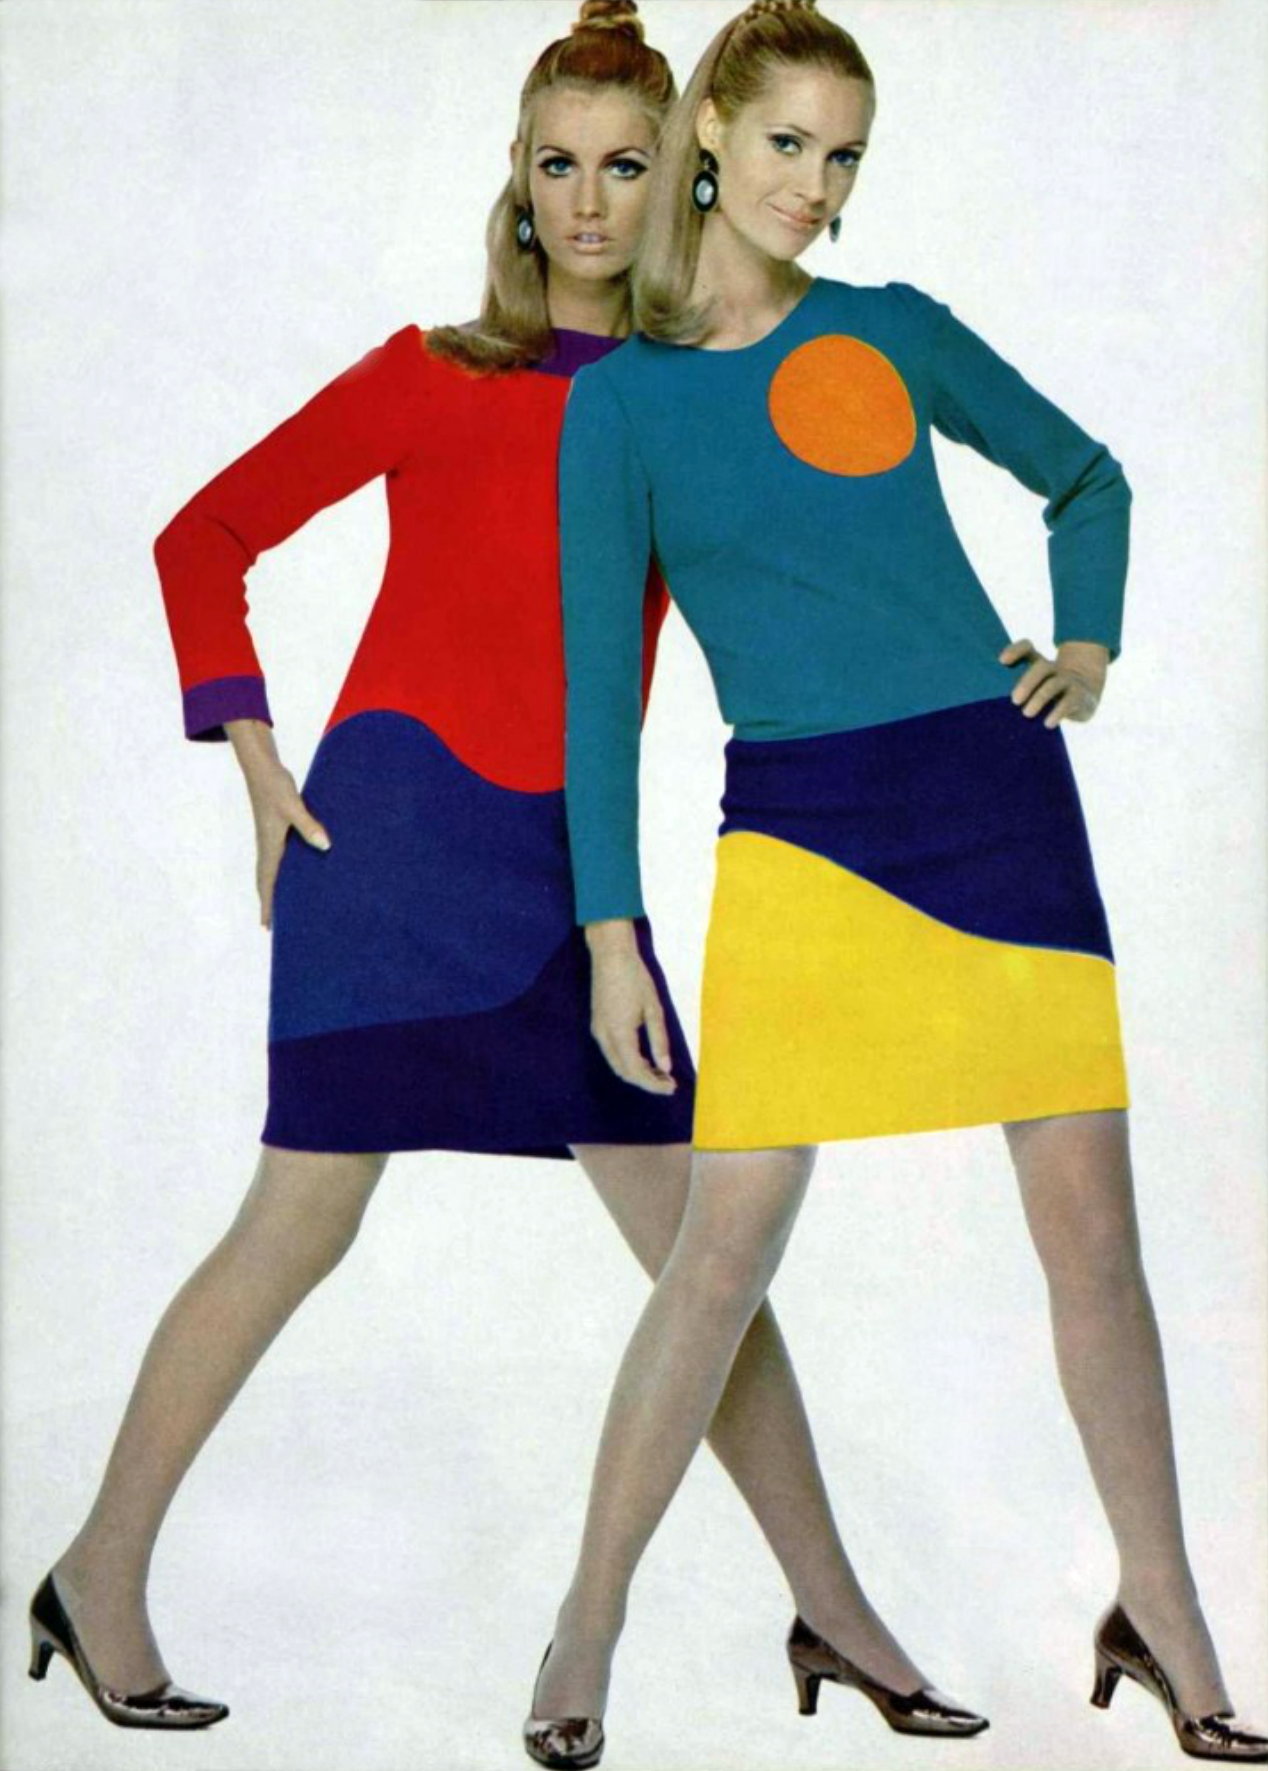 Saintlaurent fashion vintage clothing s to s